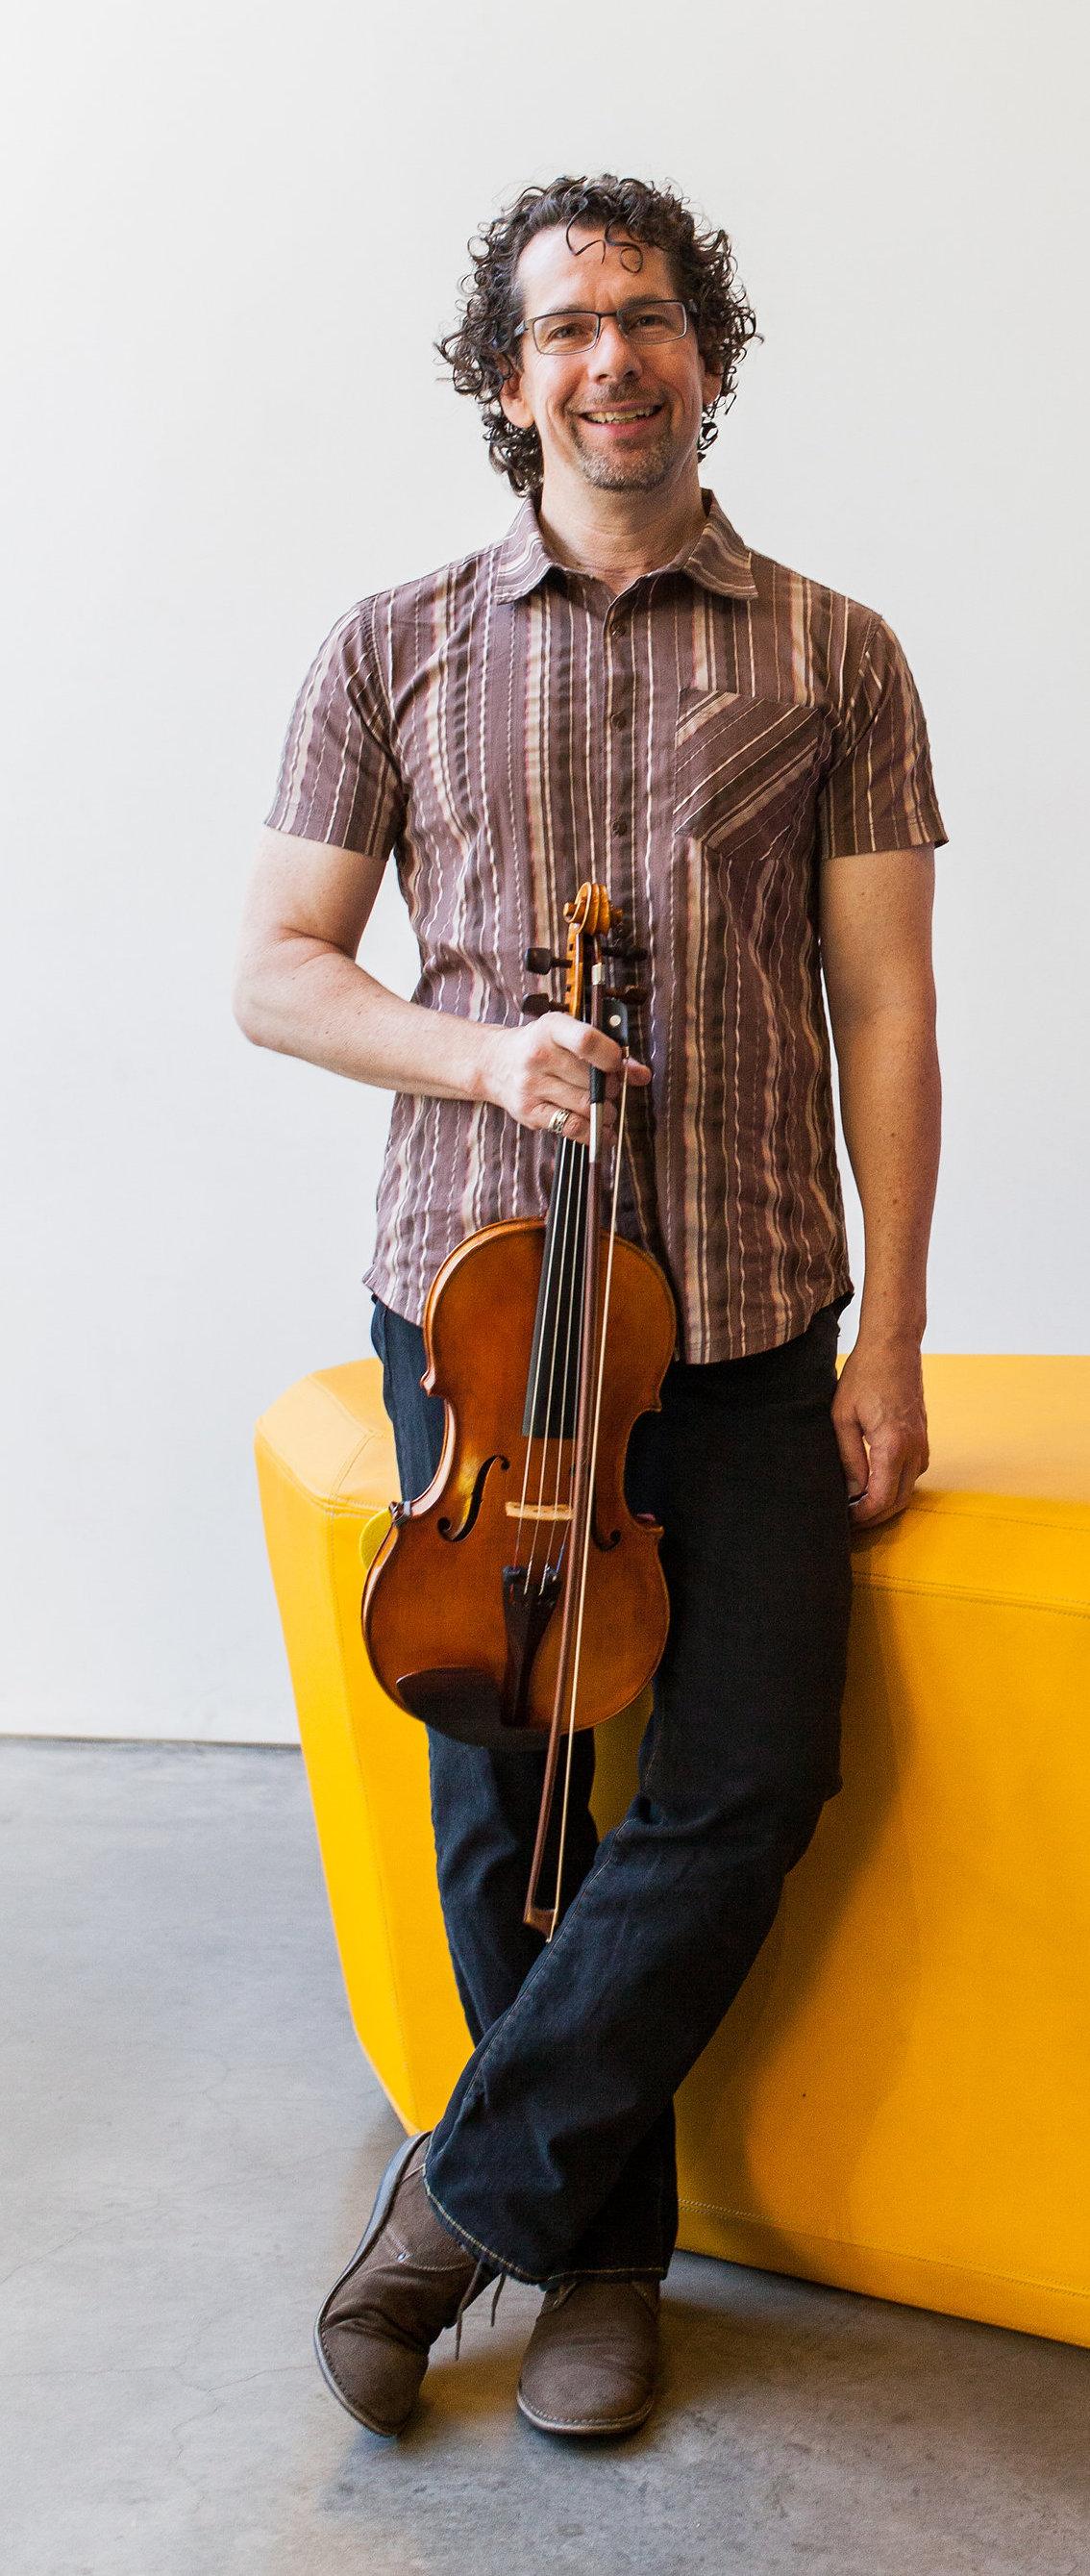 Kurt Rohde, composer/violist/artistic advisor